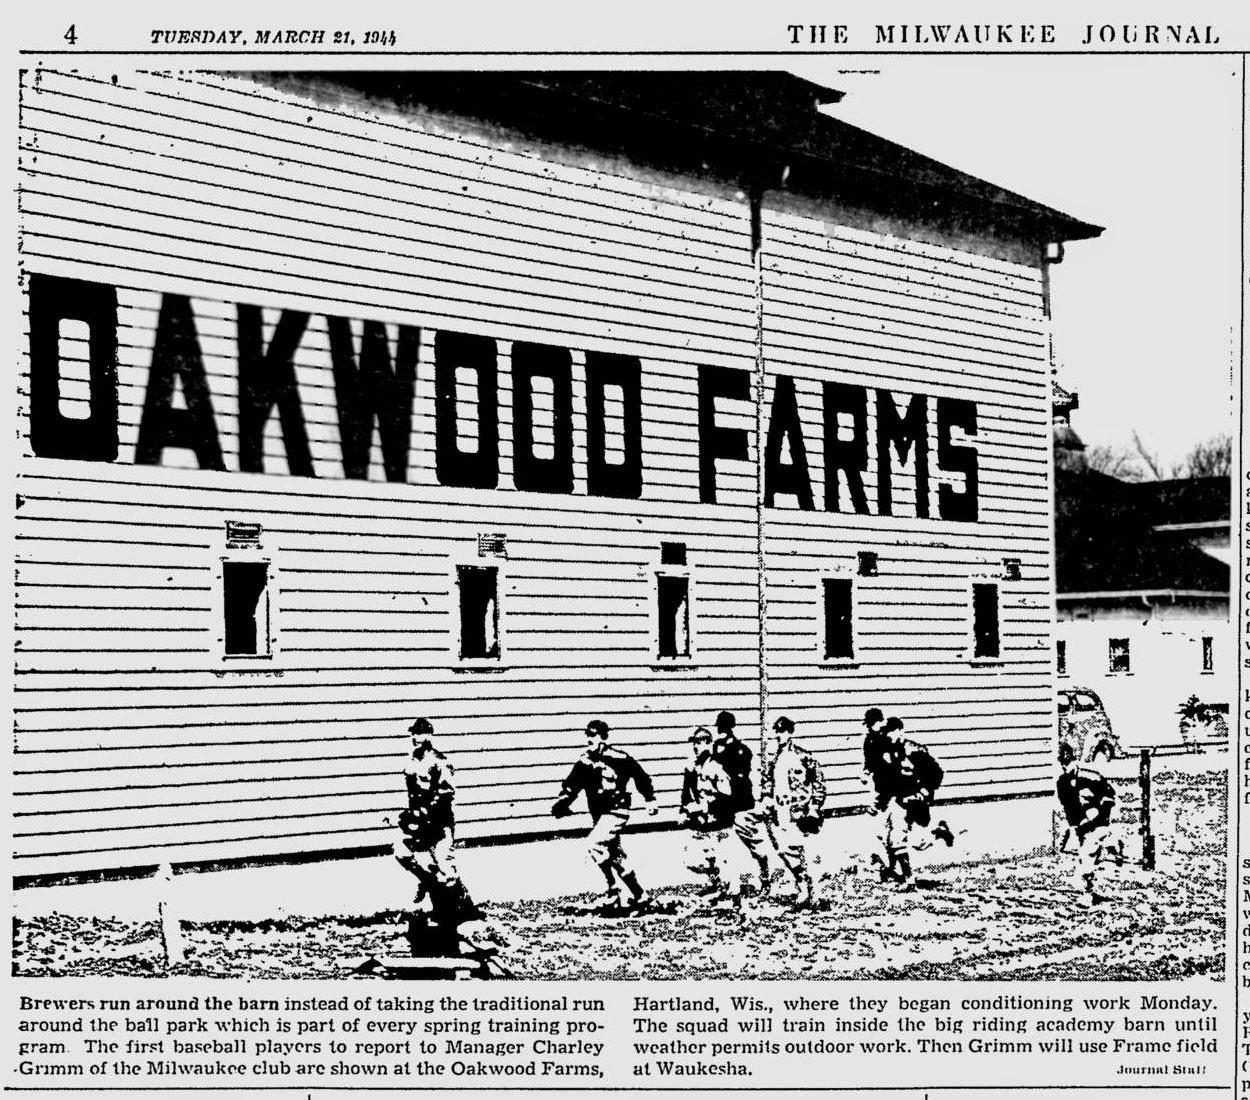 Borchert Field: Today in 1944 - Opening Spring Training